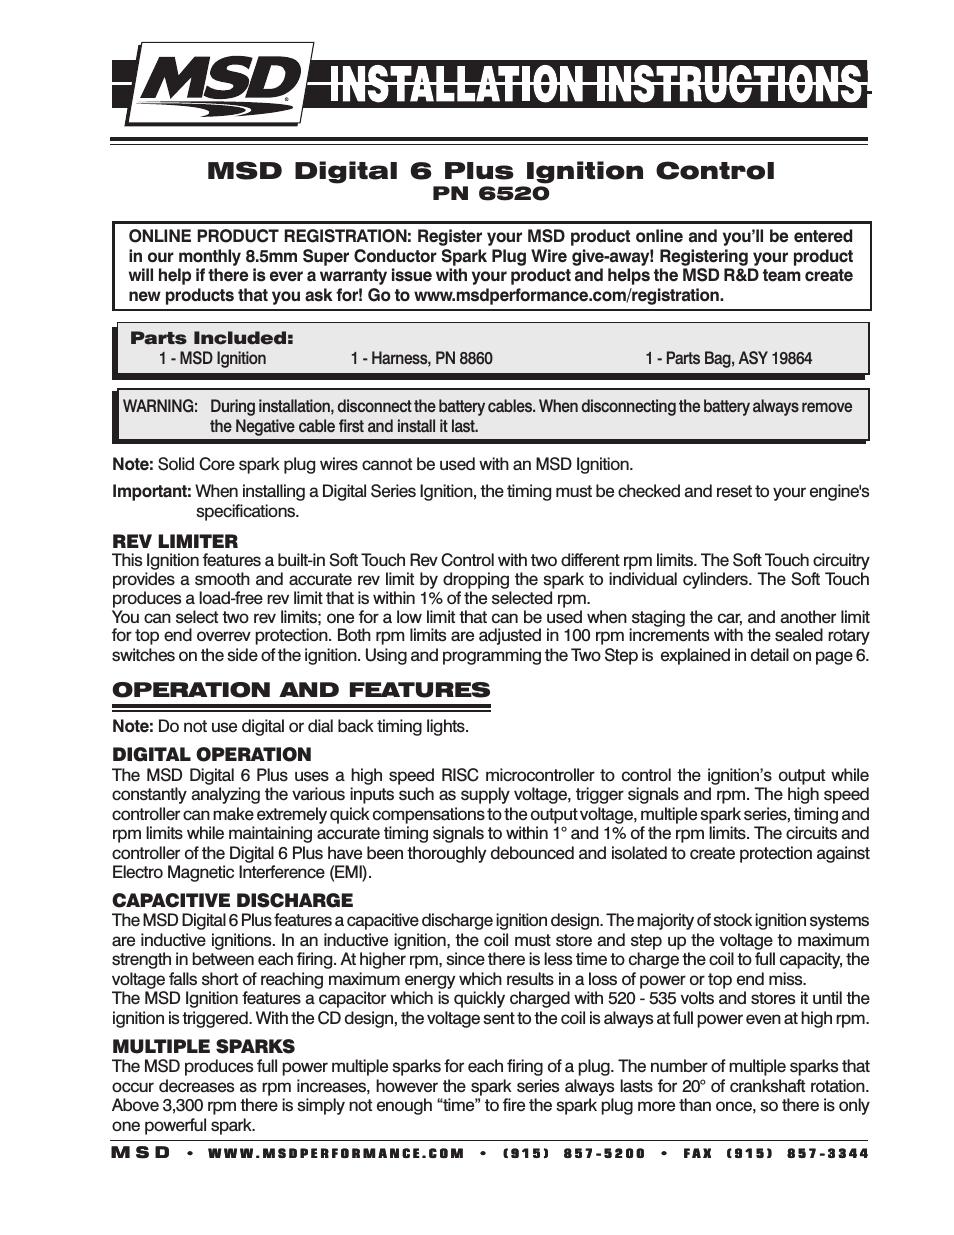 Msd 6520 Digital 6-Plus Ignition Control Installation User Manual - Msd Digital 6 Plus Wiring Diagram